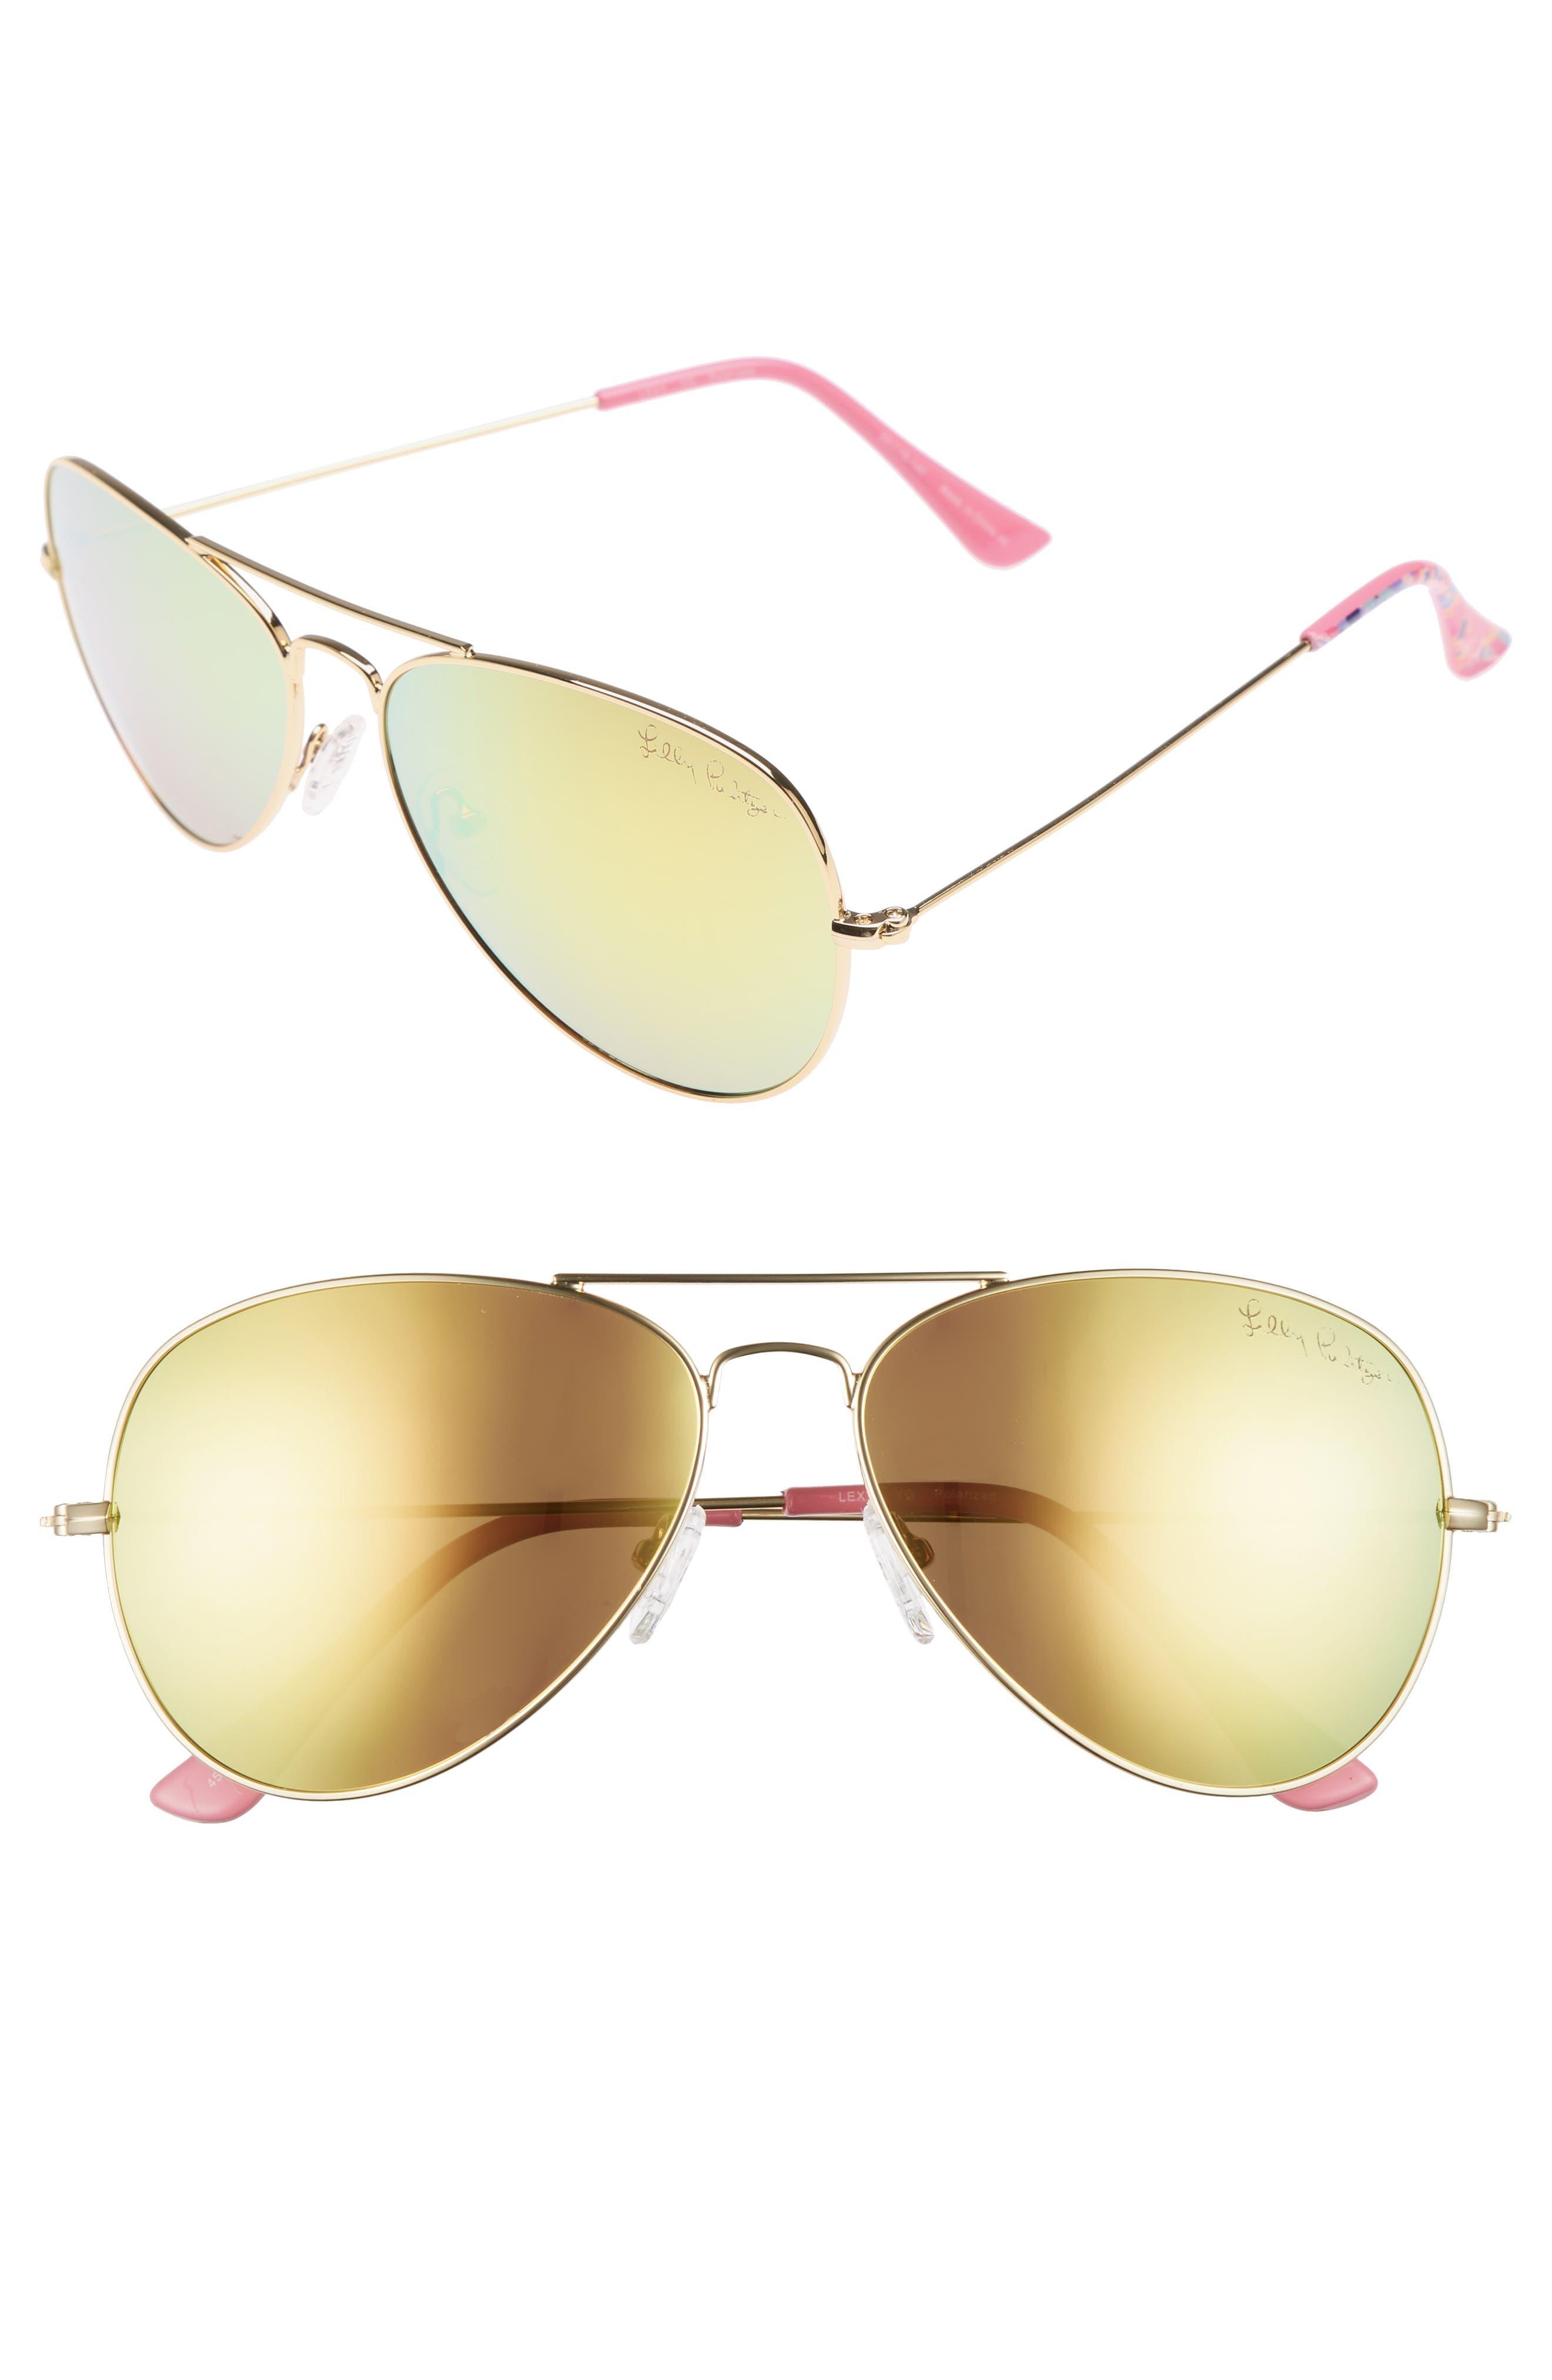 Lilly Pulitzer® Lexy 59mm Polarized Aviator Sunglasses